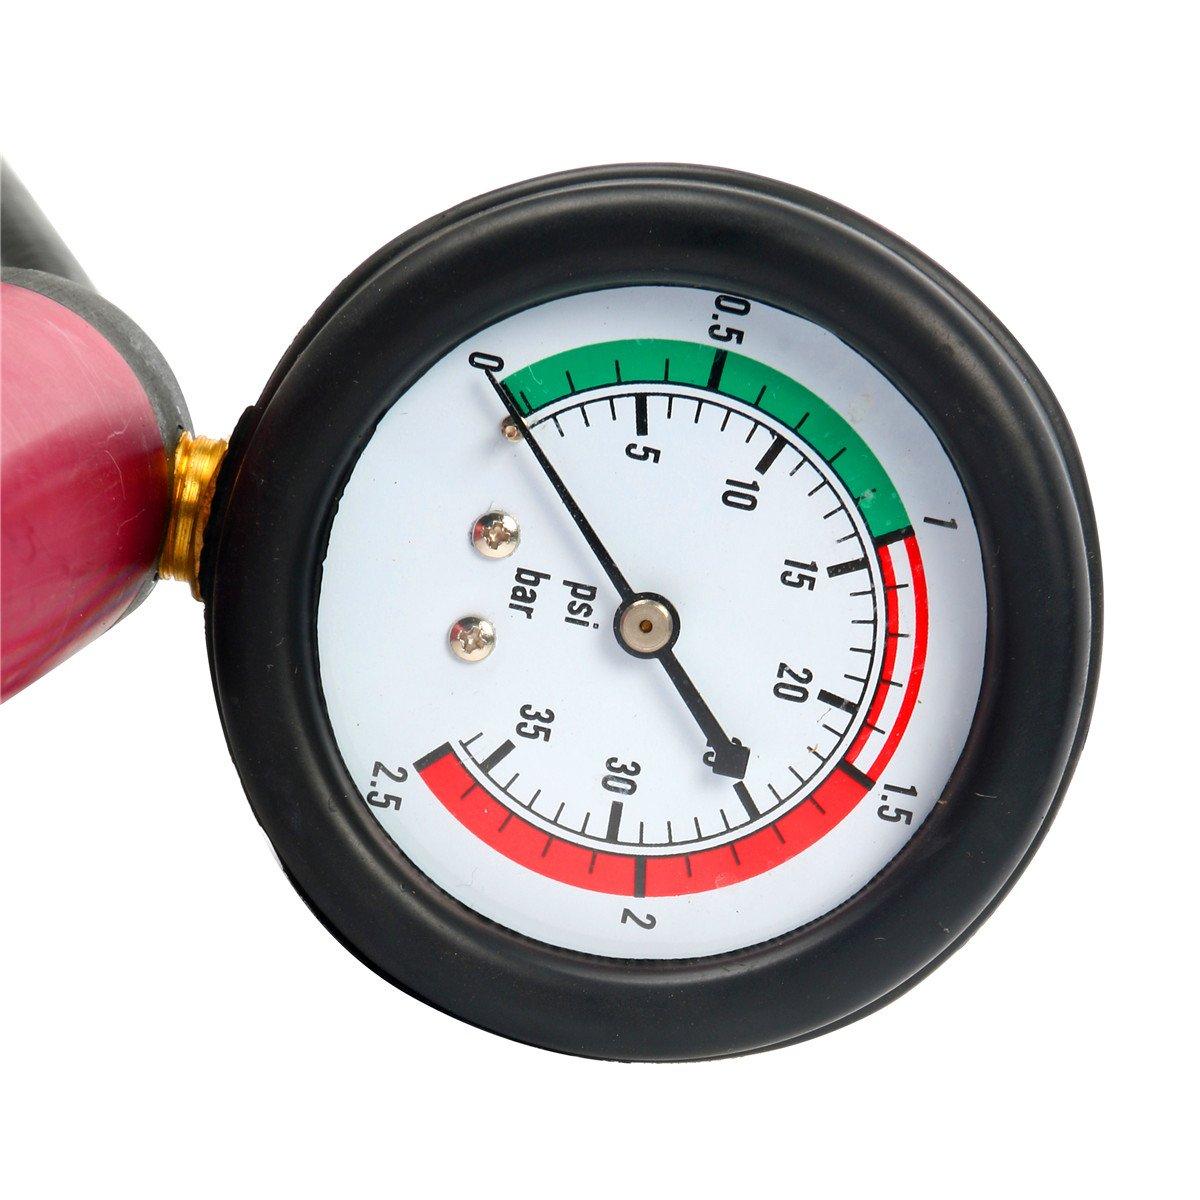 8MILELAKE 14pc Radiator Pump Pressure Leak Tester Kit Vacuum Pressure Cooling System Tester by 8MILELAKE (Image #3)